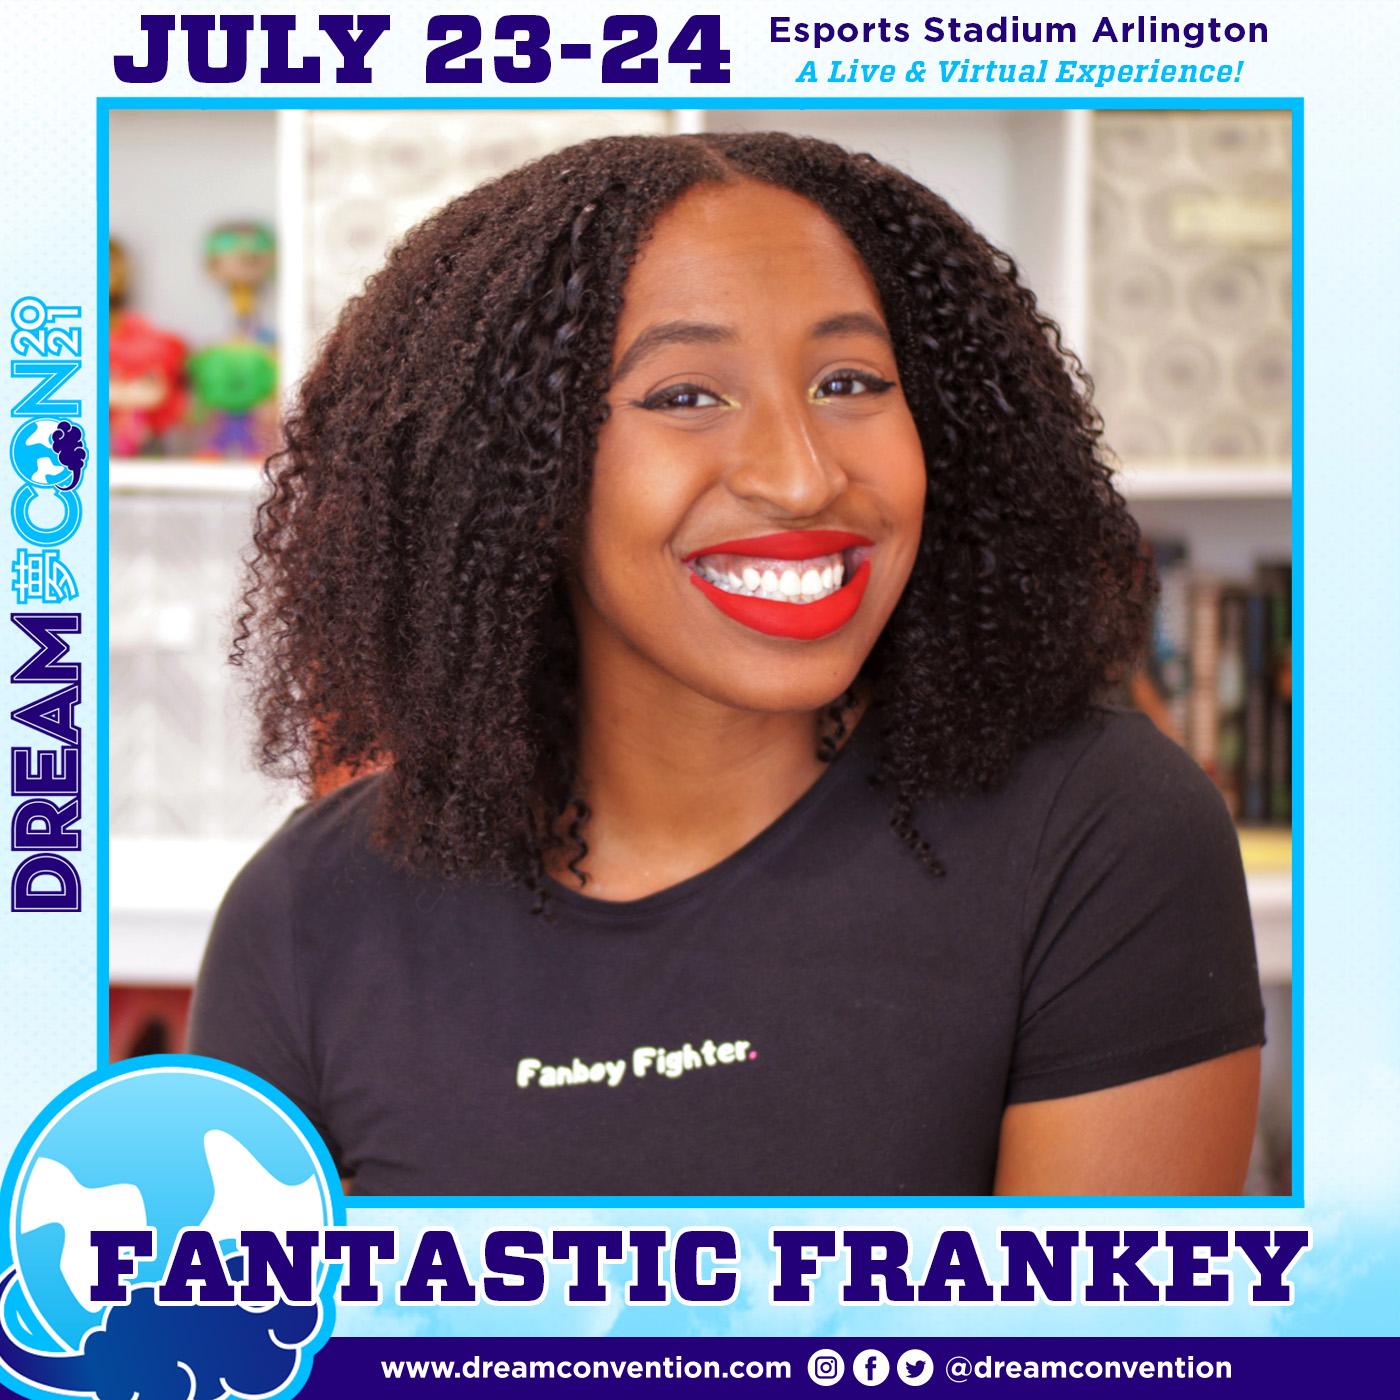 Fantastic Frankey